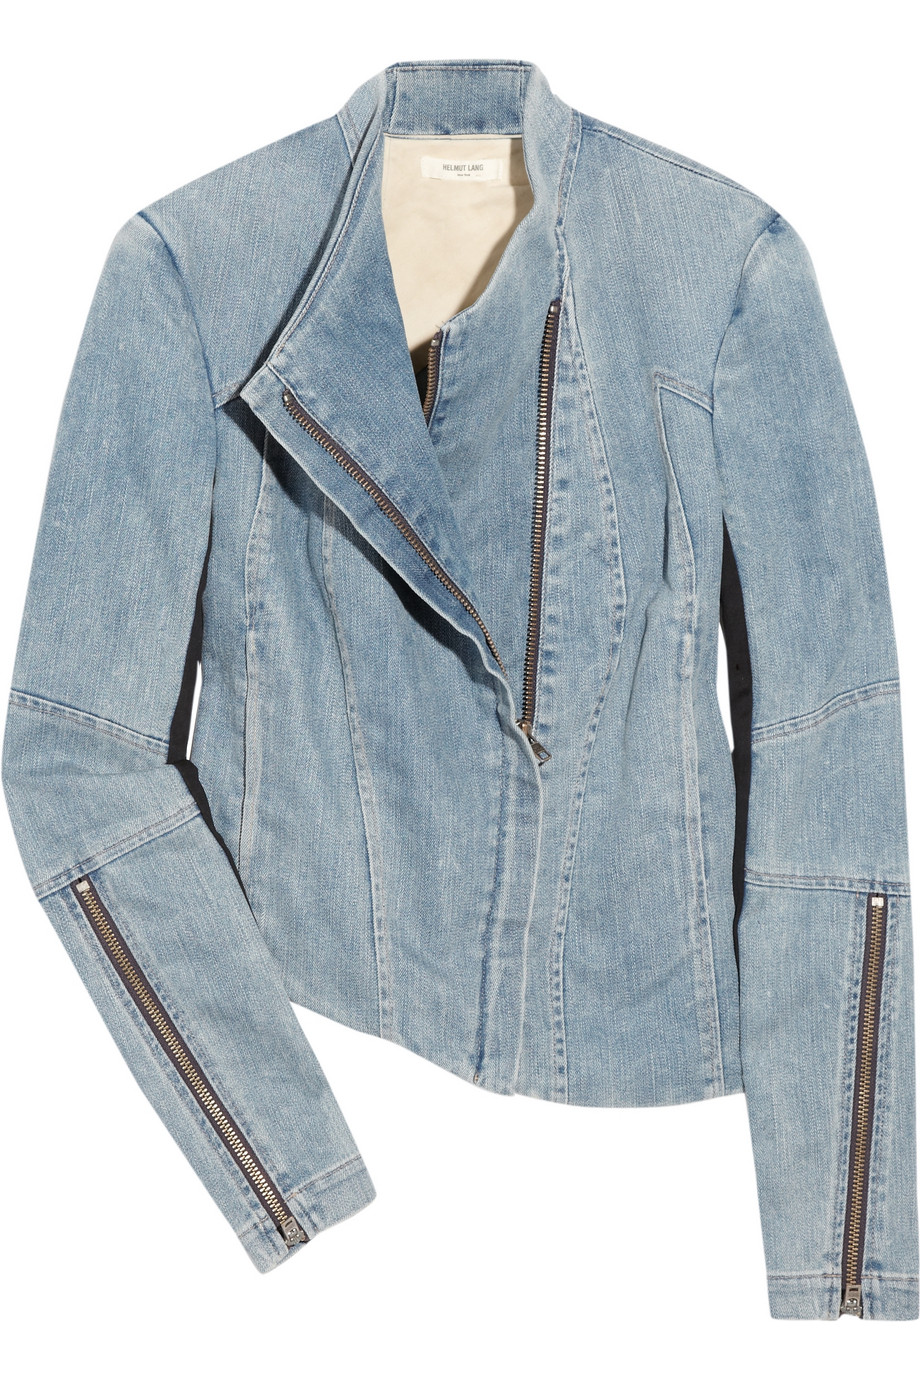 Helmut lang Asymmetric Stretch-denim Jacket in Blue | Lyst